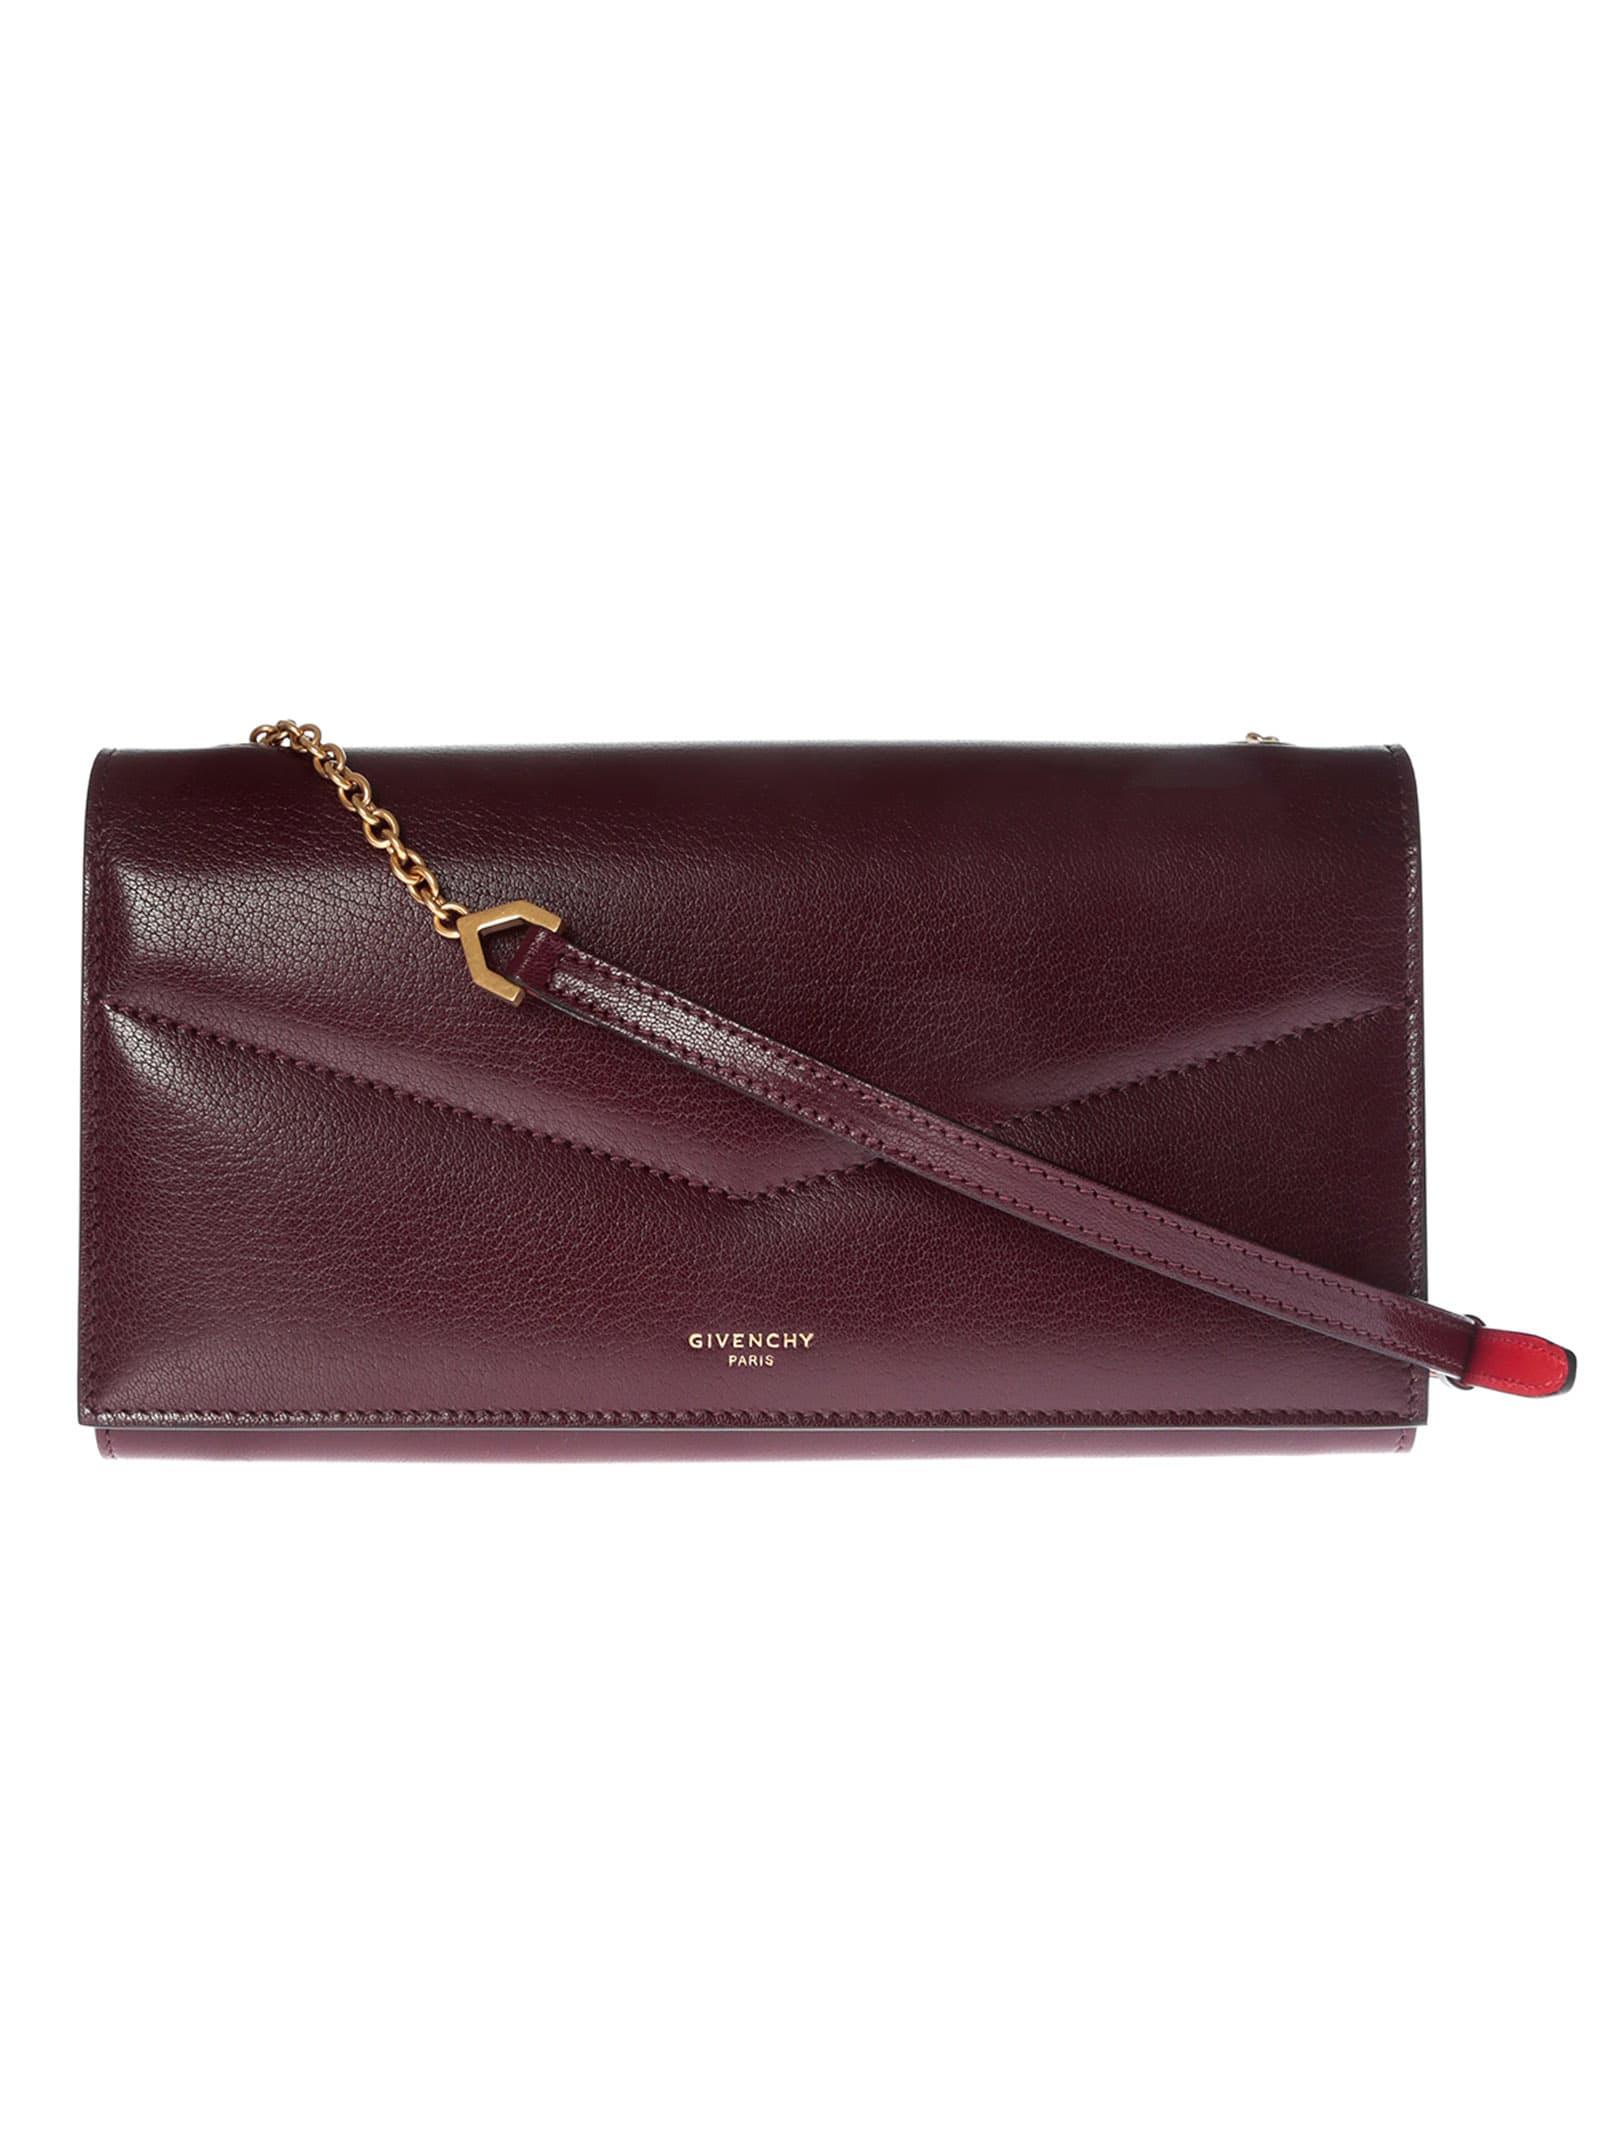 6d718b66caa Givenchy Edge Chain Wallet